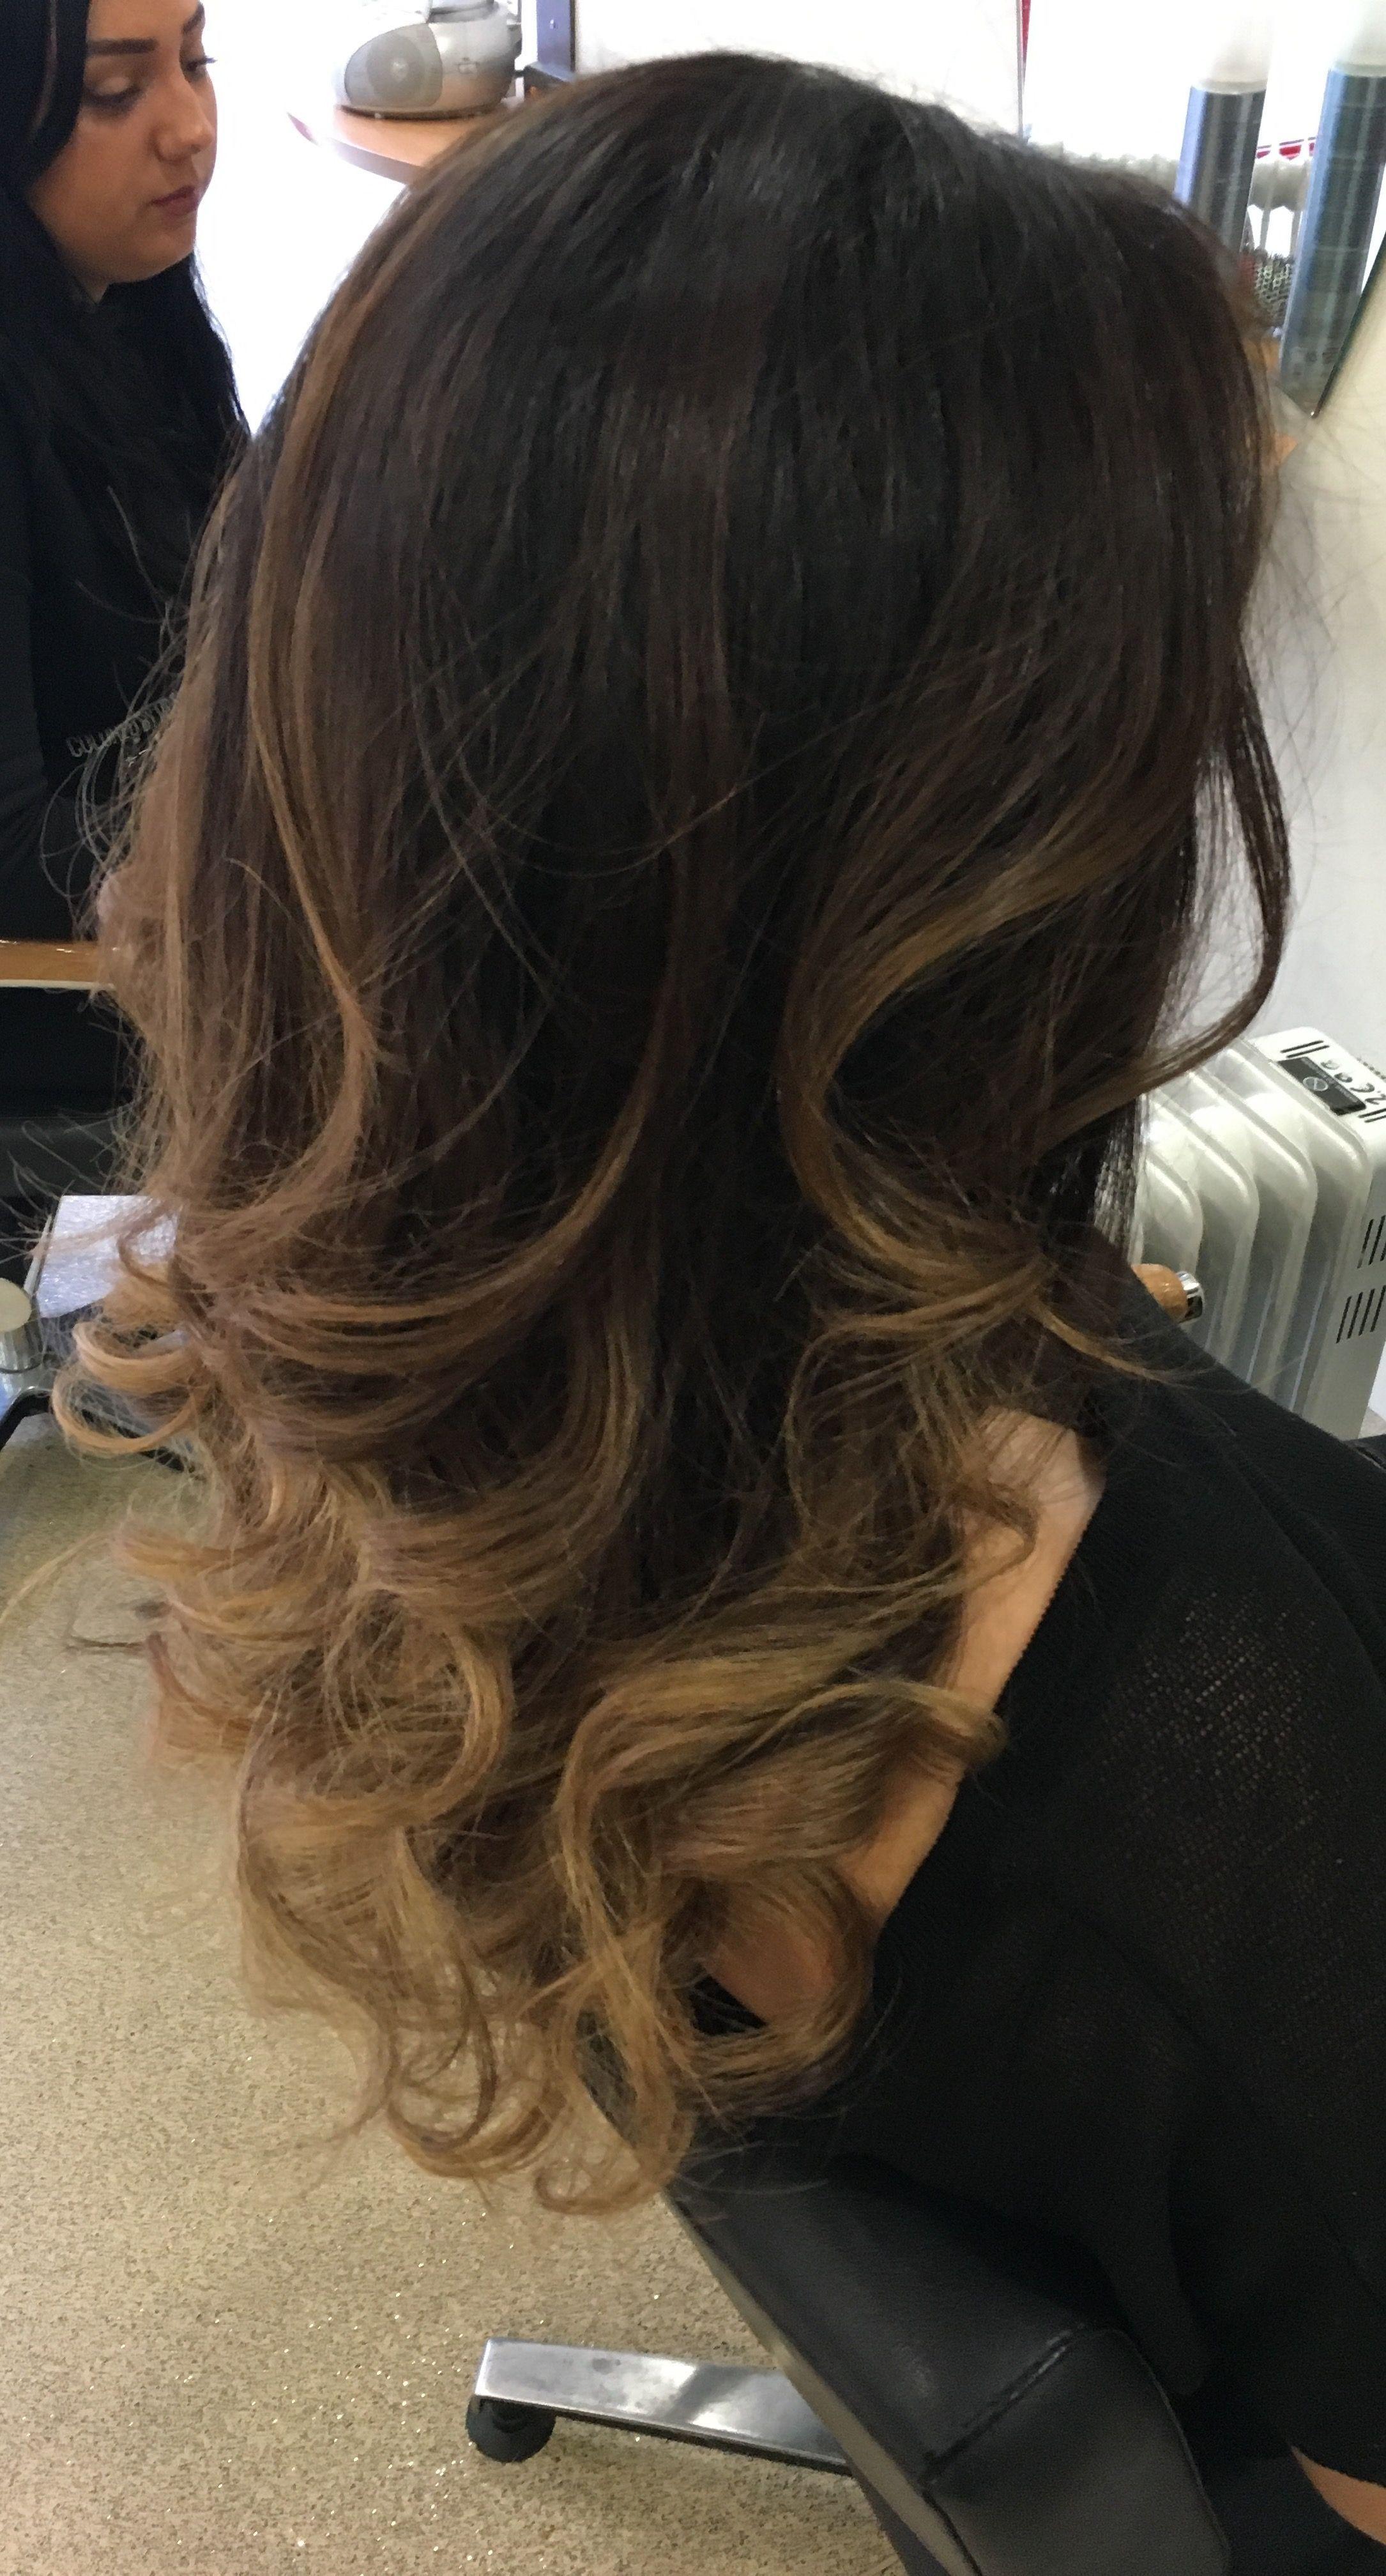 Short Layered Haircut And Blow Dry